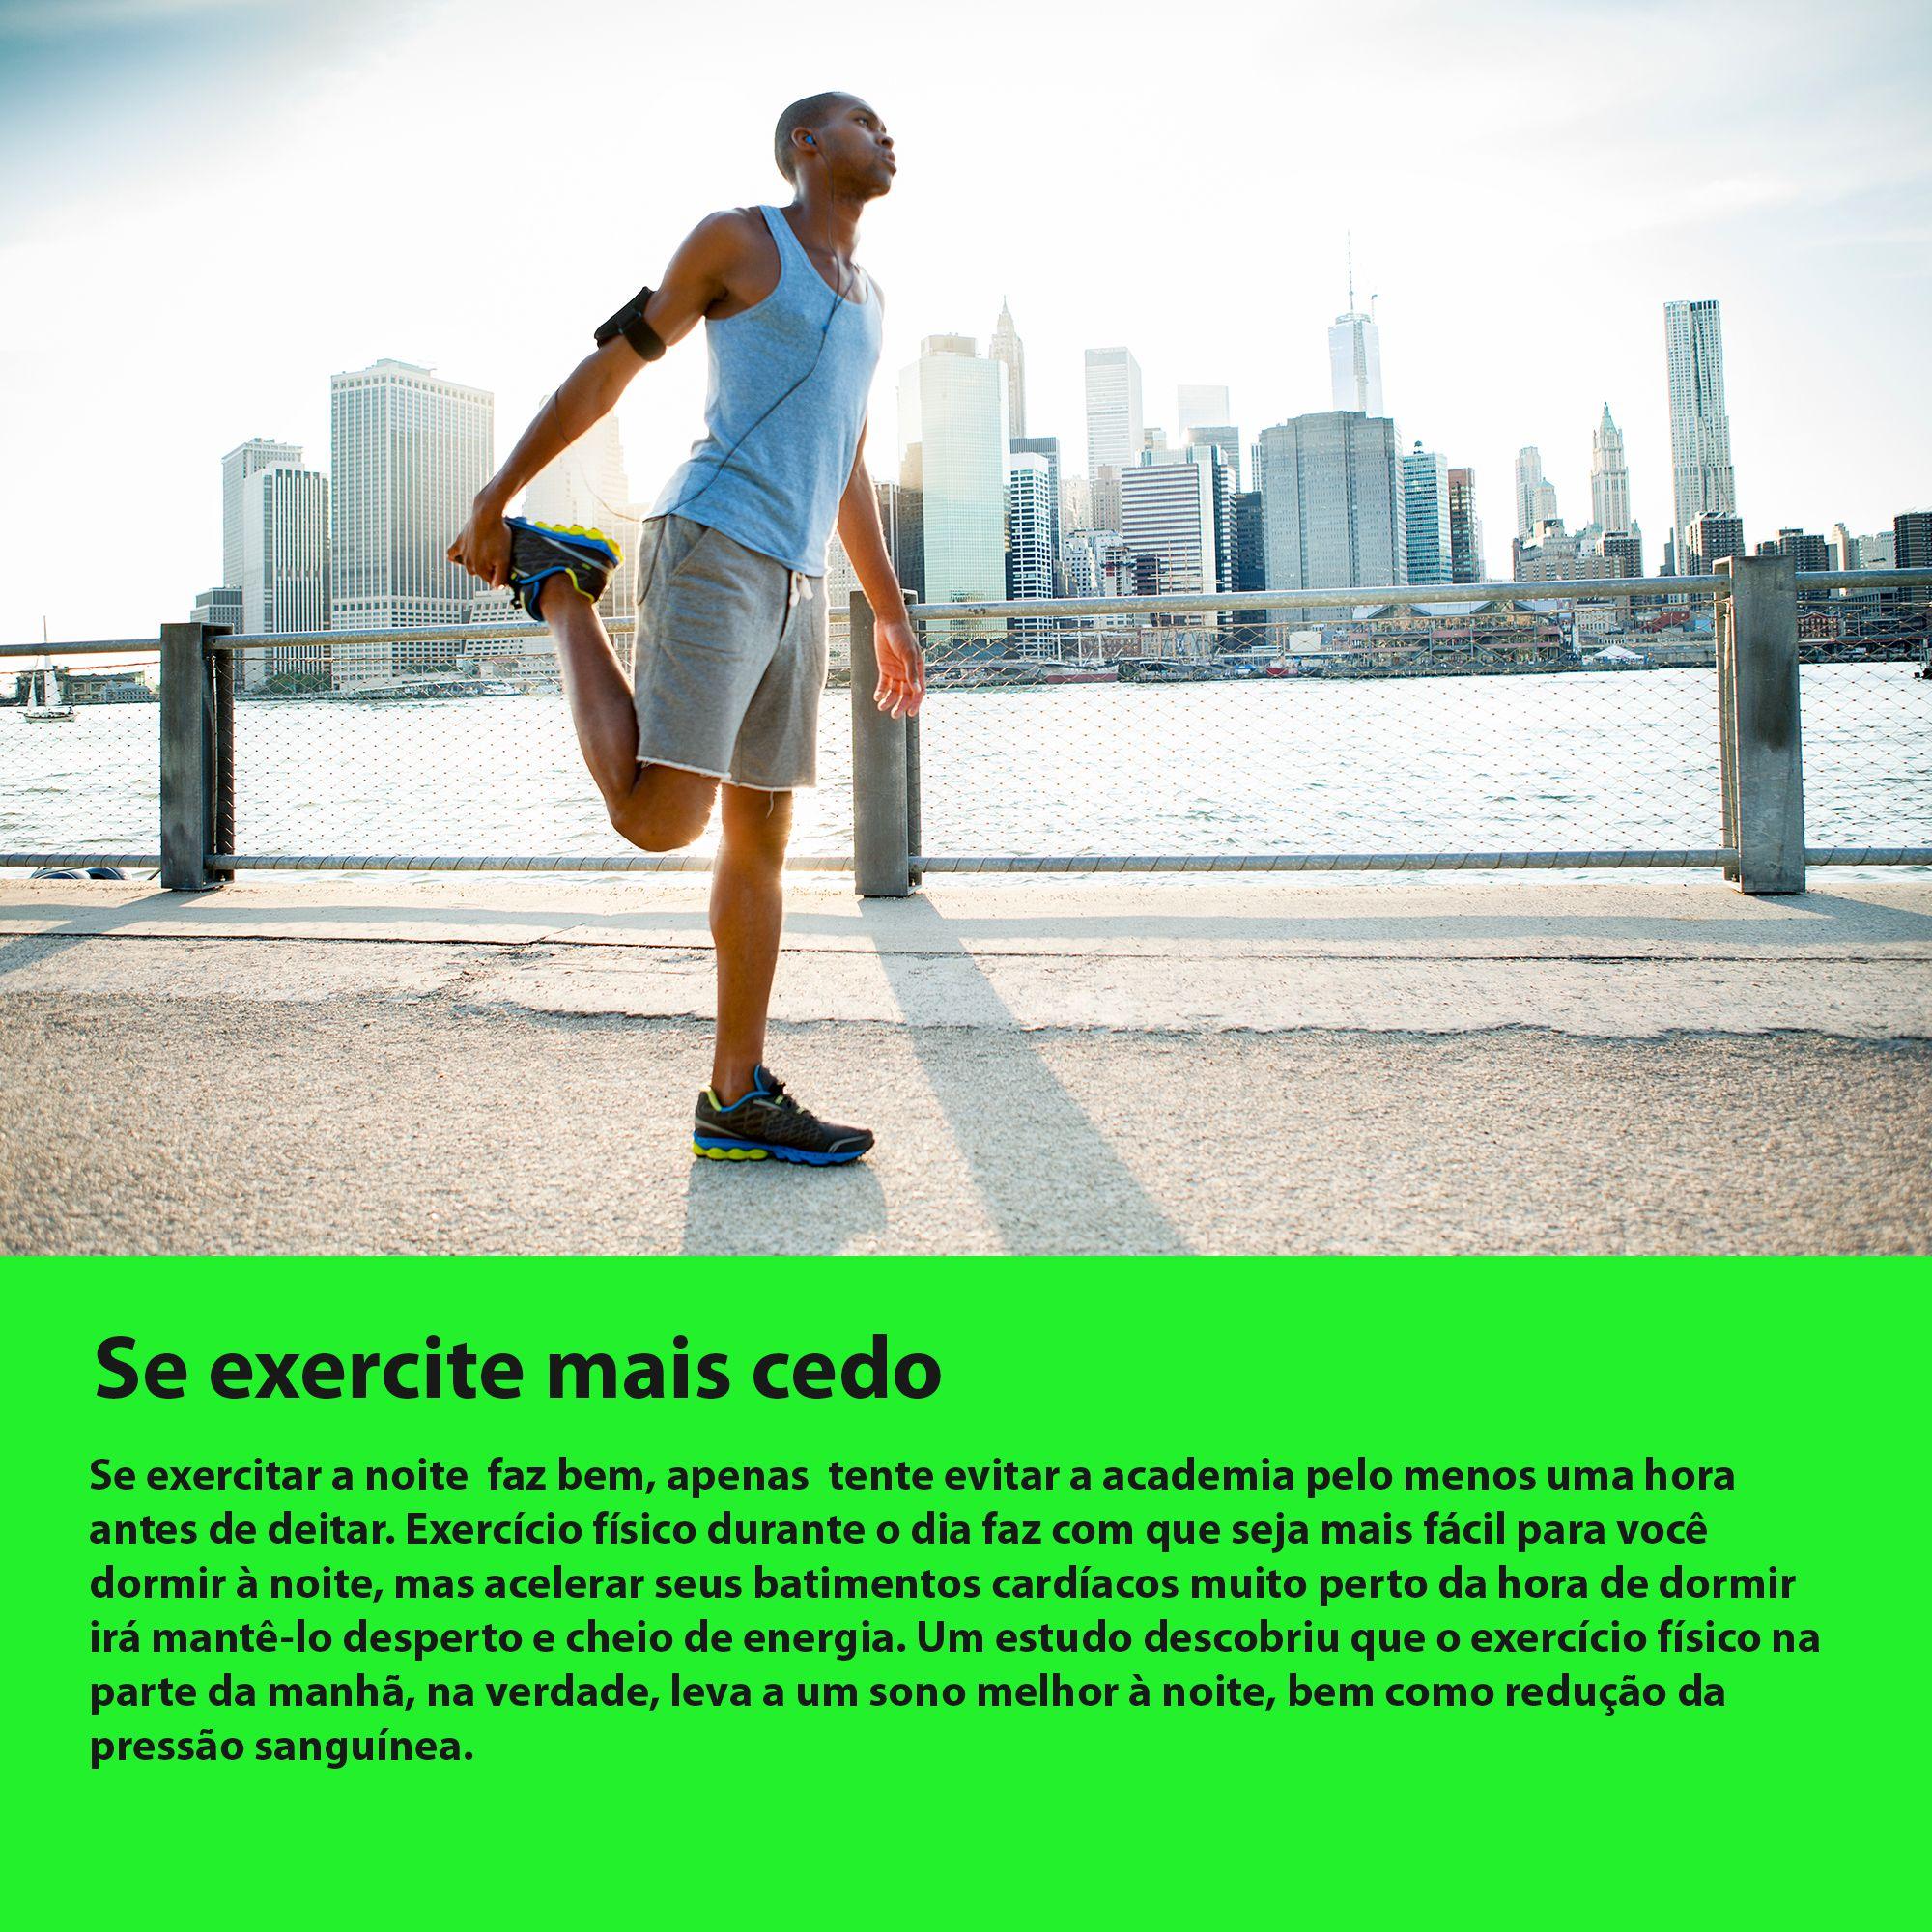 #fabsproject #exerciseduringtheday #exerciseearlier #healthy #healthyliving #healthylifestyle #stayhealthy #reducebloodpressure Siga-nos no twitter https://twitter.com/fabsproject Siga-nos no Instagram http://instagram.com/fabianawurfbain